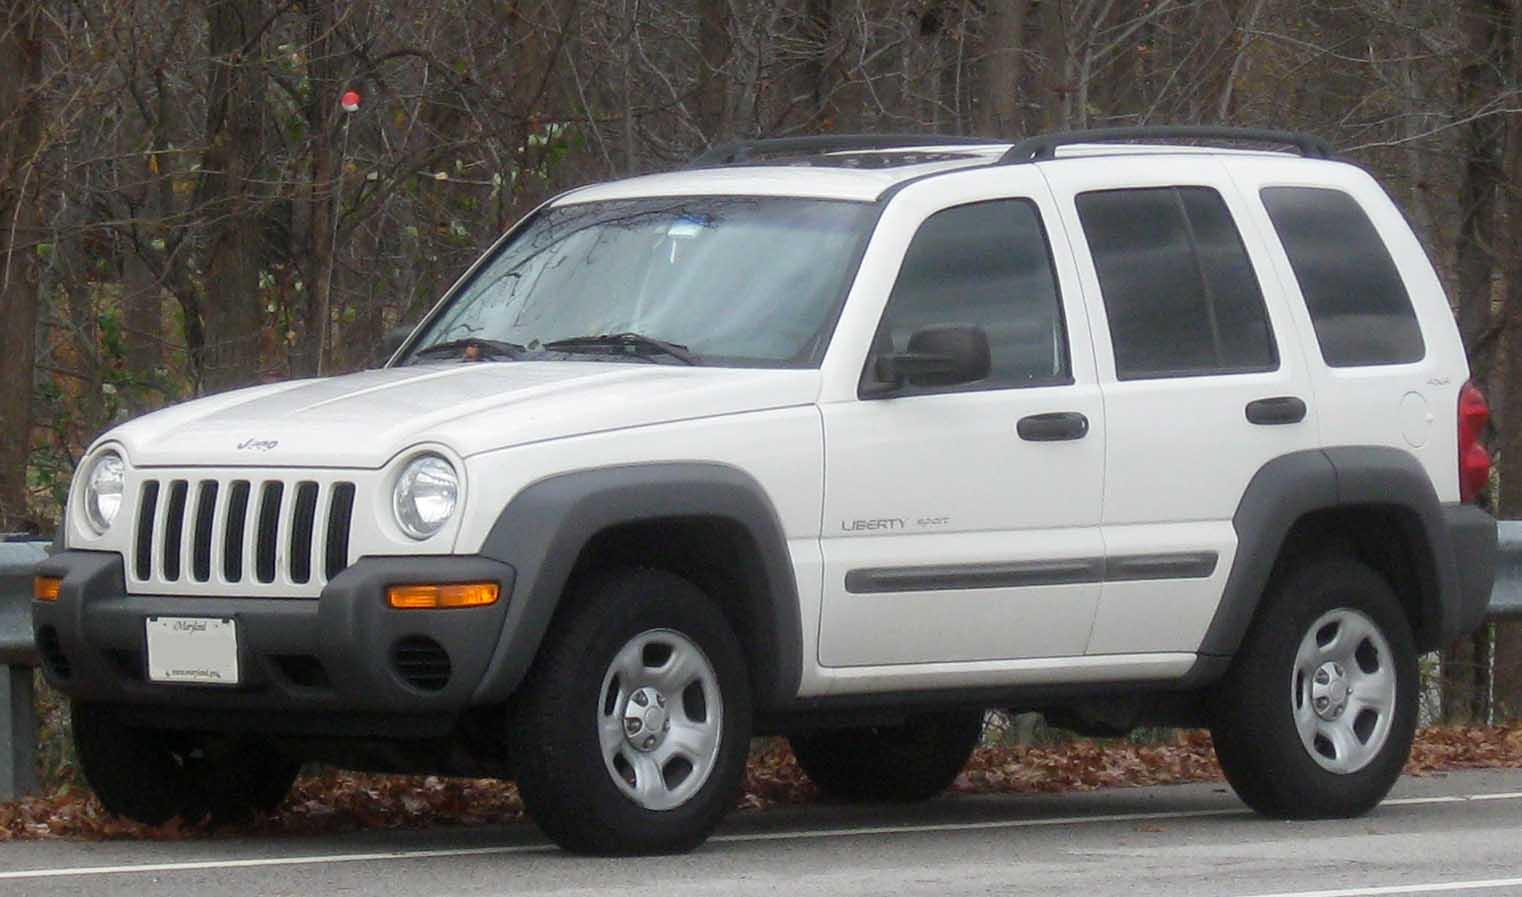 2002 Jeep Liberty #2 Jeep Liberty #2